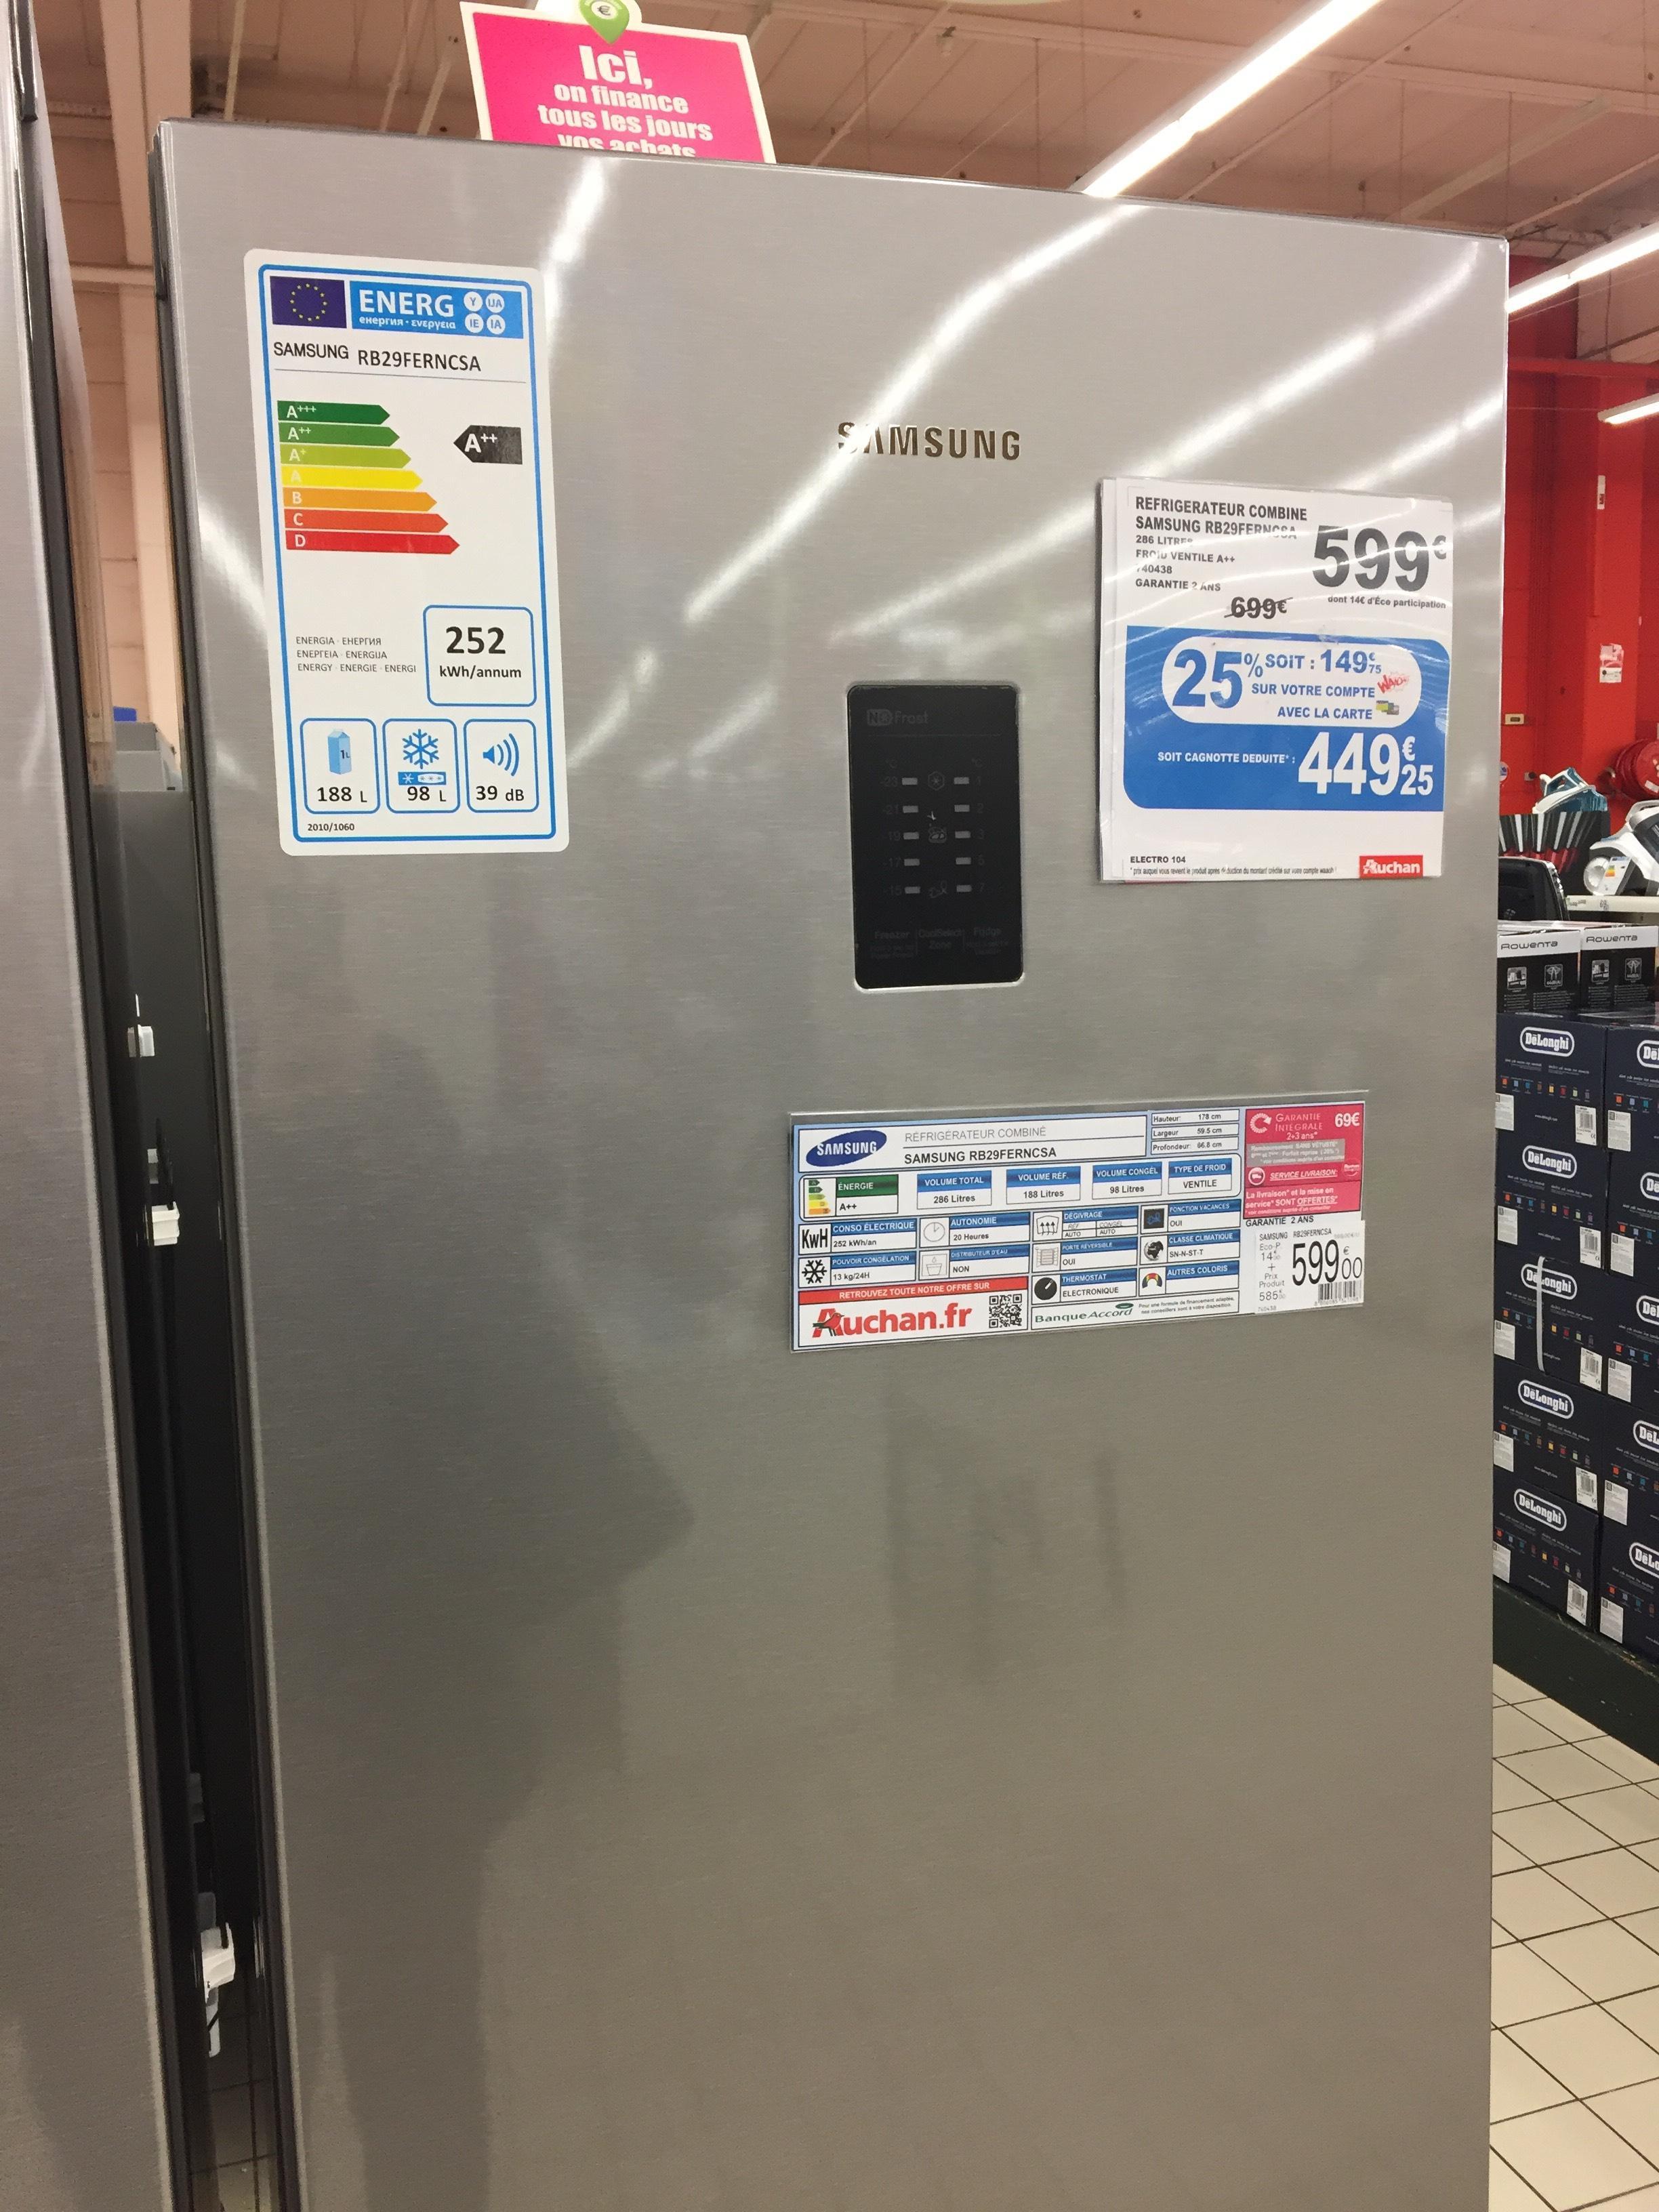 Combiné frigo/congélateur Samsung RB29FERNCSA  (via 149,75€ sur la carte)